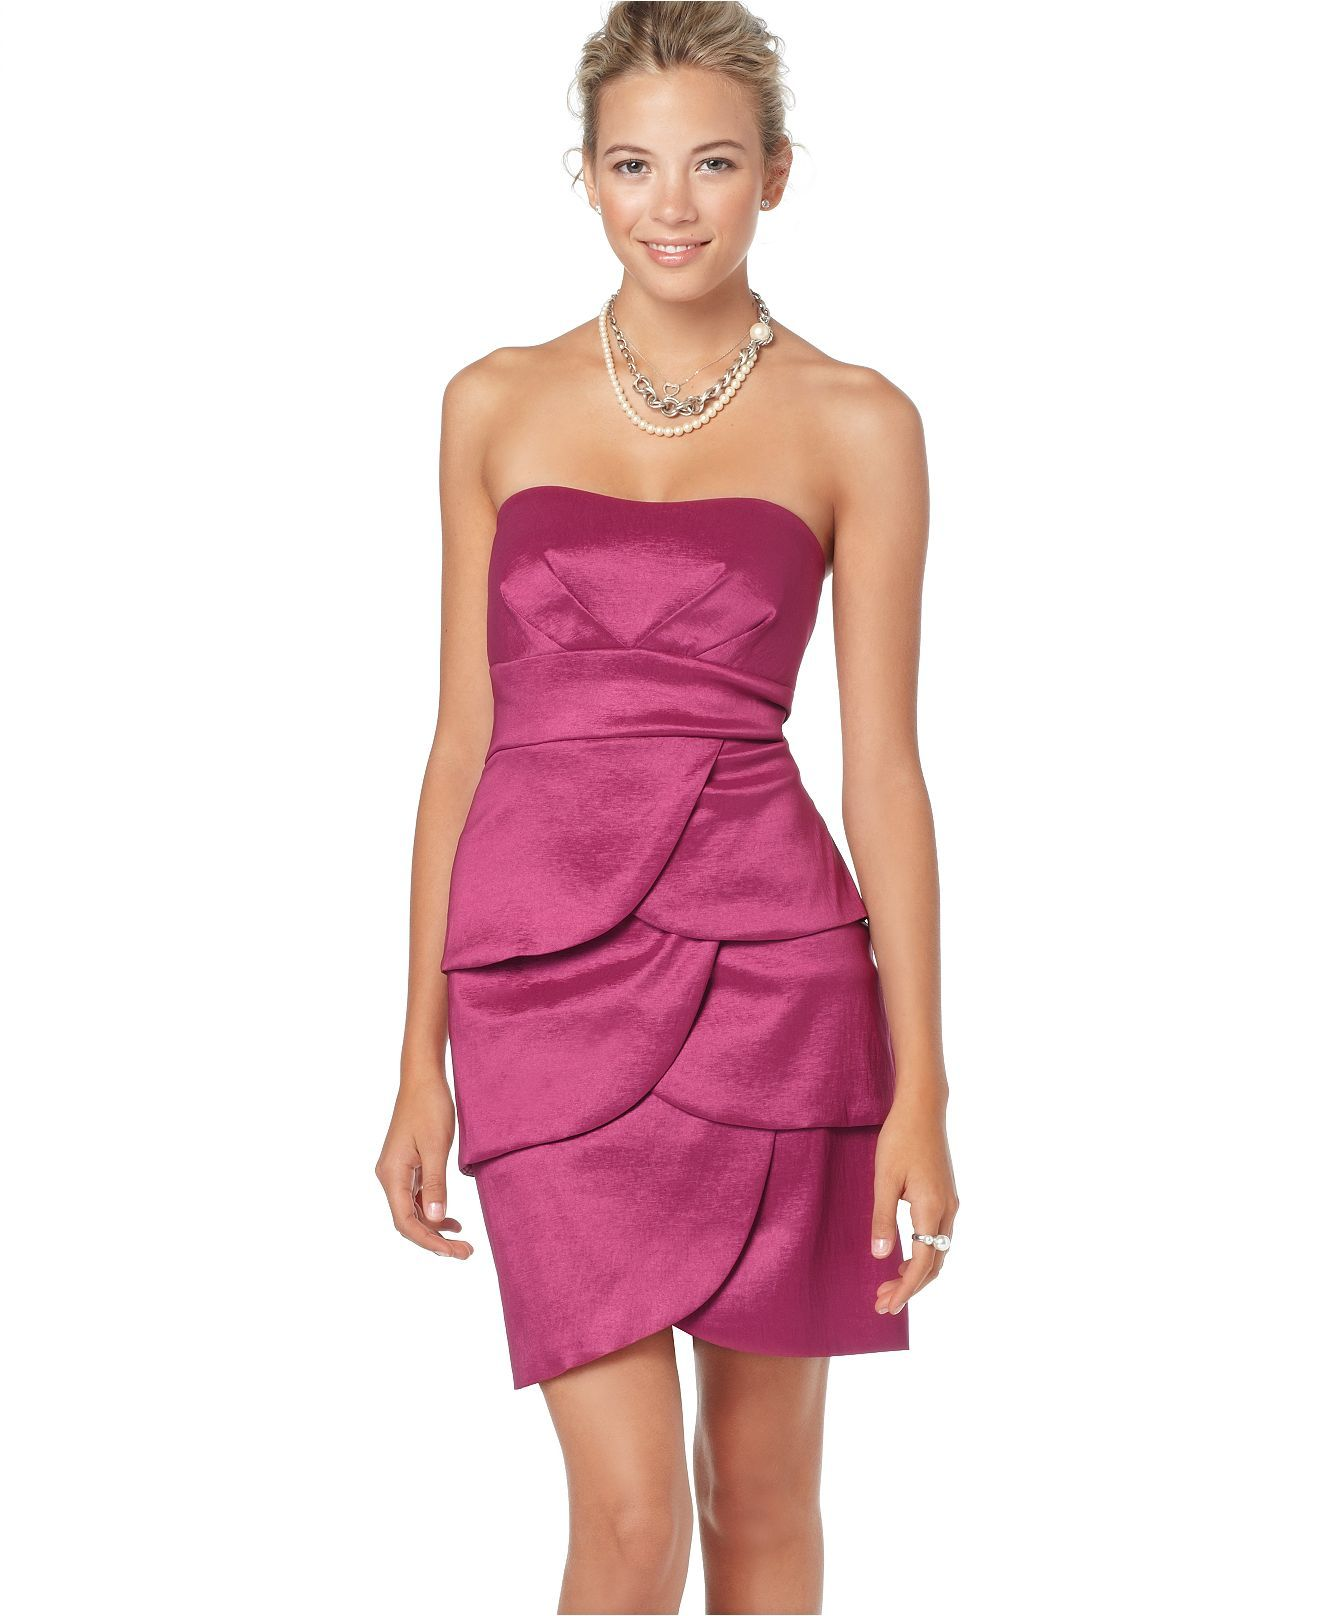 I like this wish dresses junior dresses review dresses